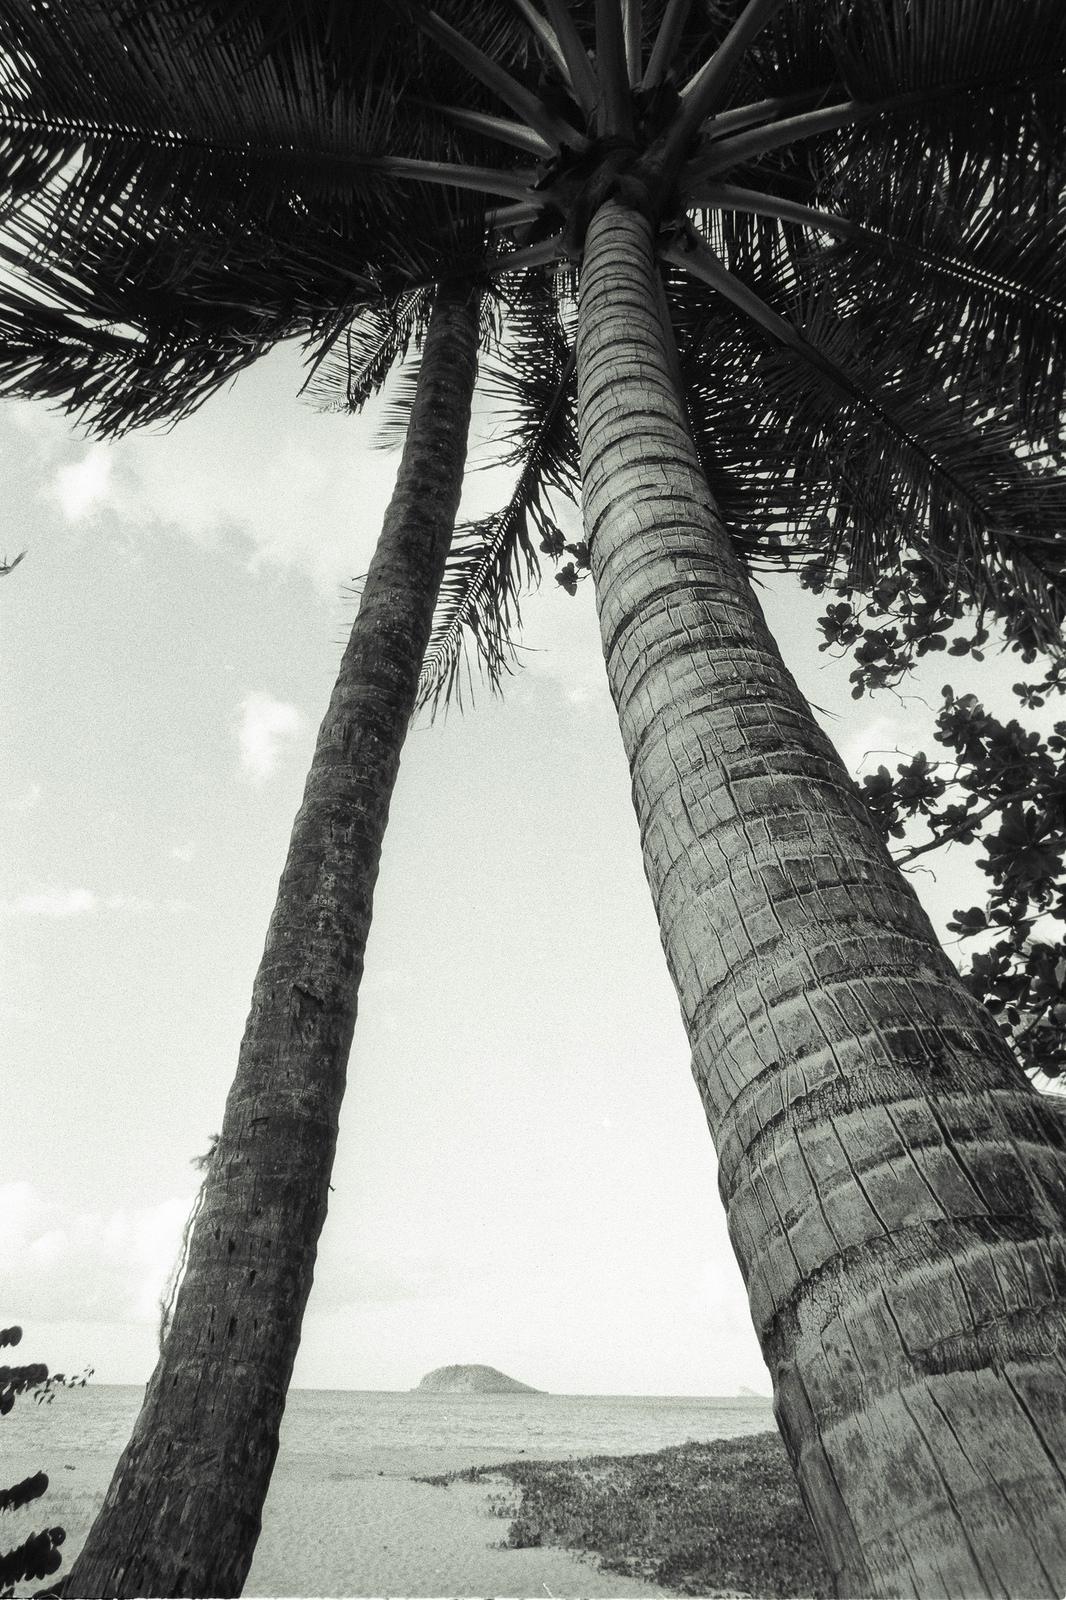 Tropical lines, love palm trees - nonophuran | ello